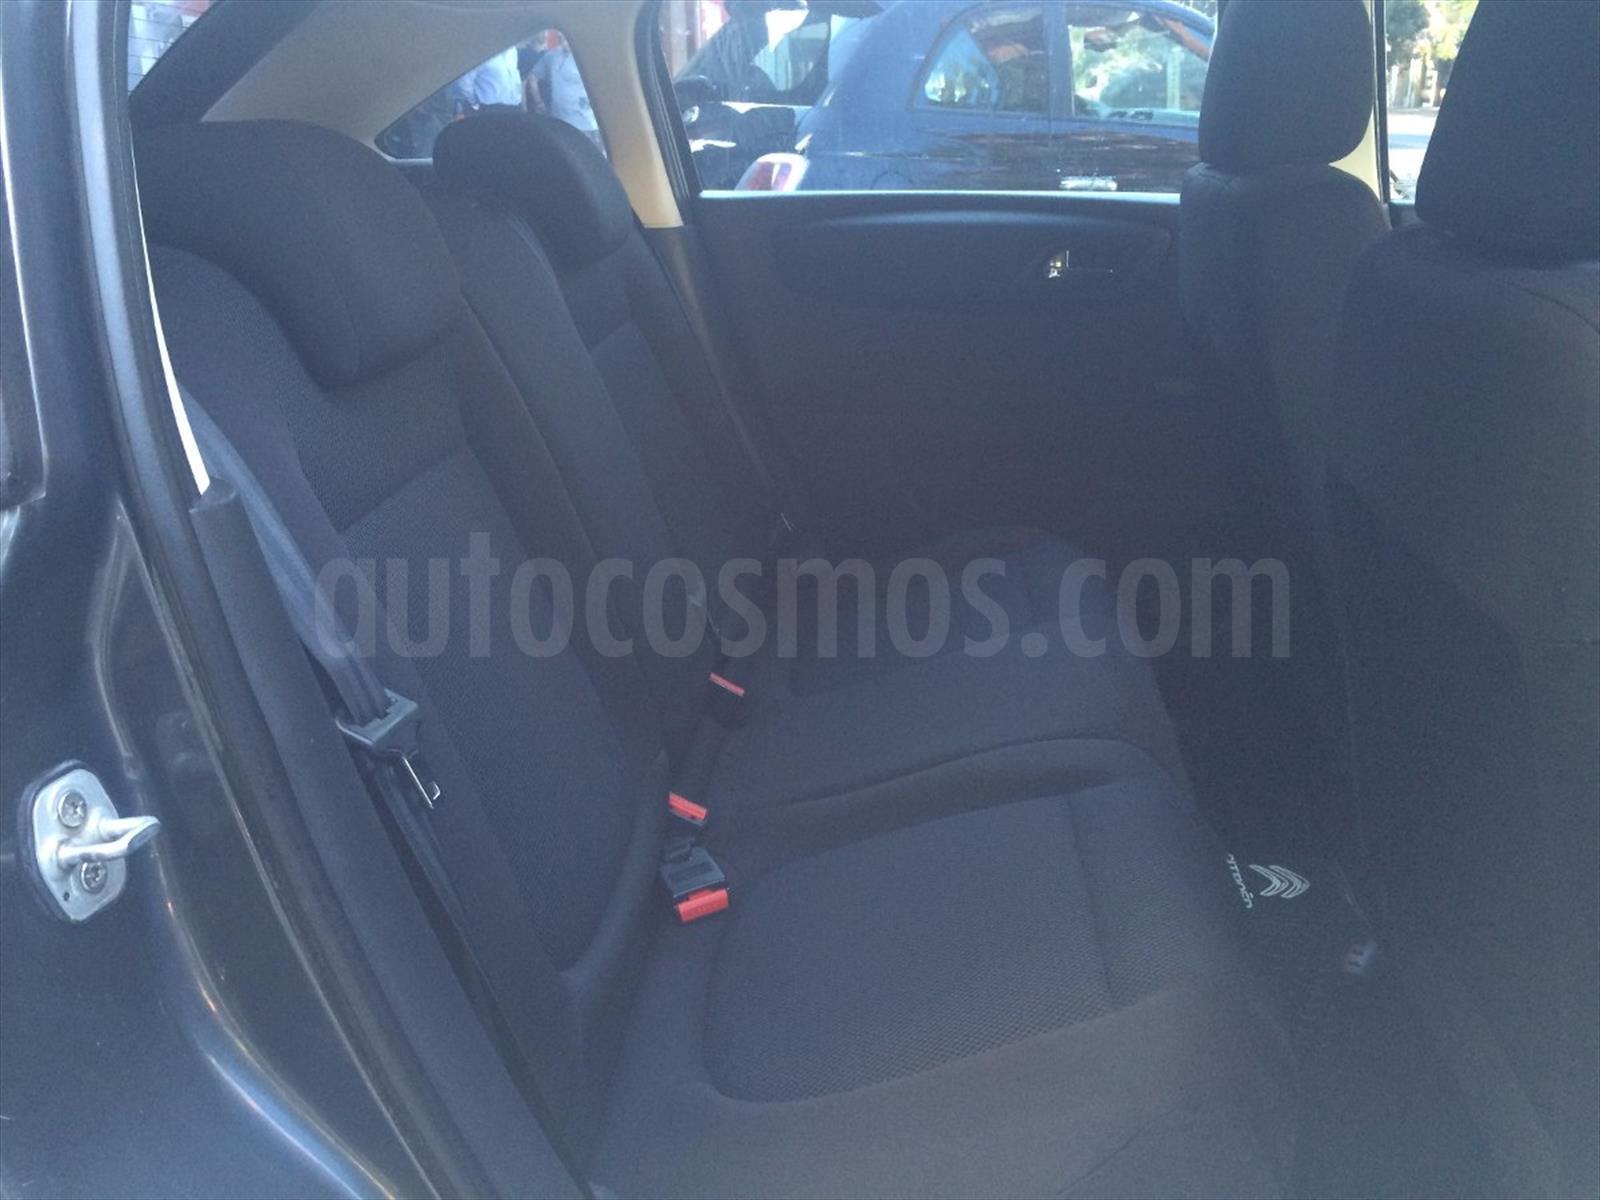 Venta autos usado - Capital Federal - Citroen C4 Hatchback